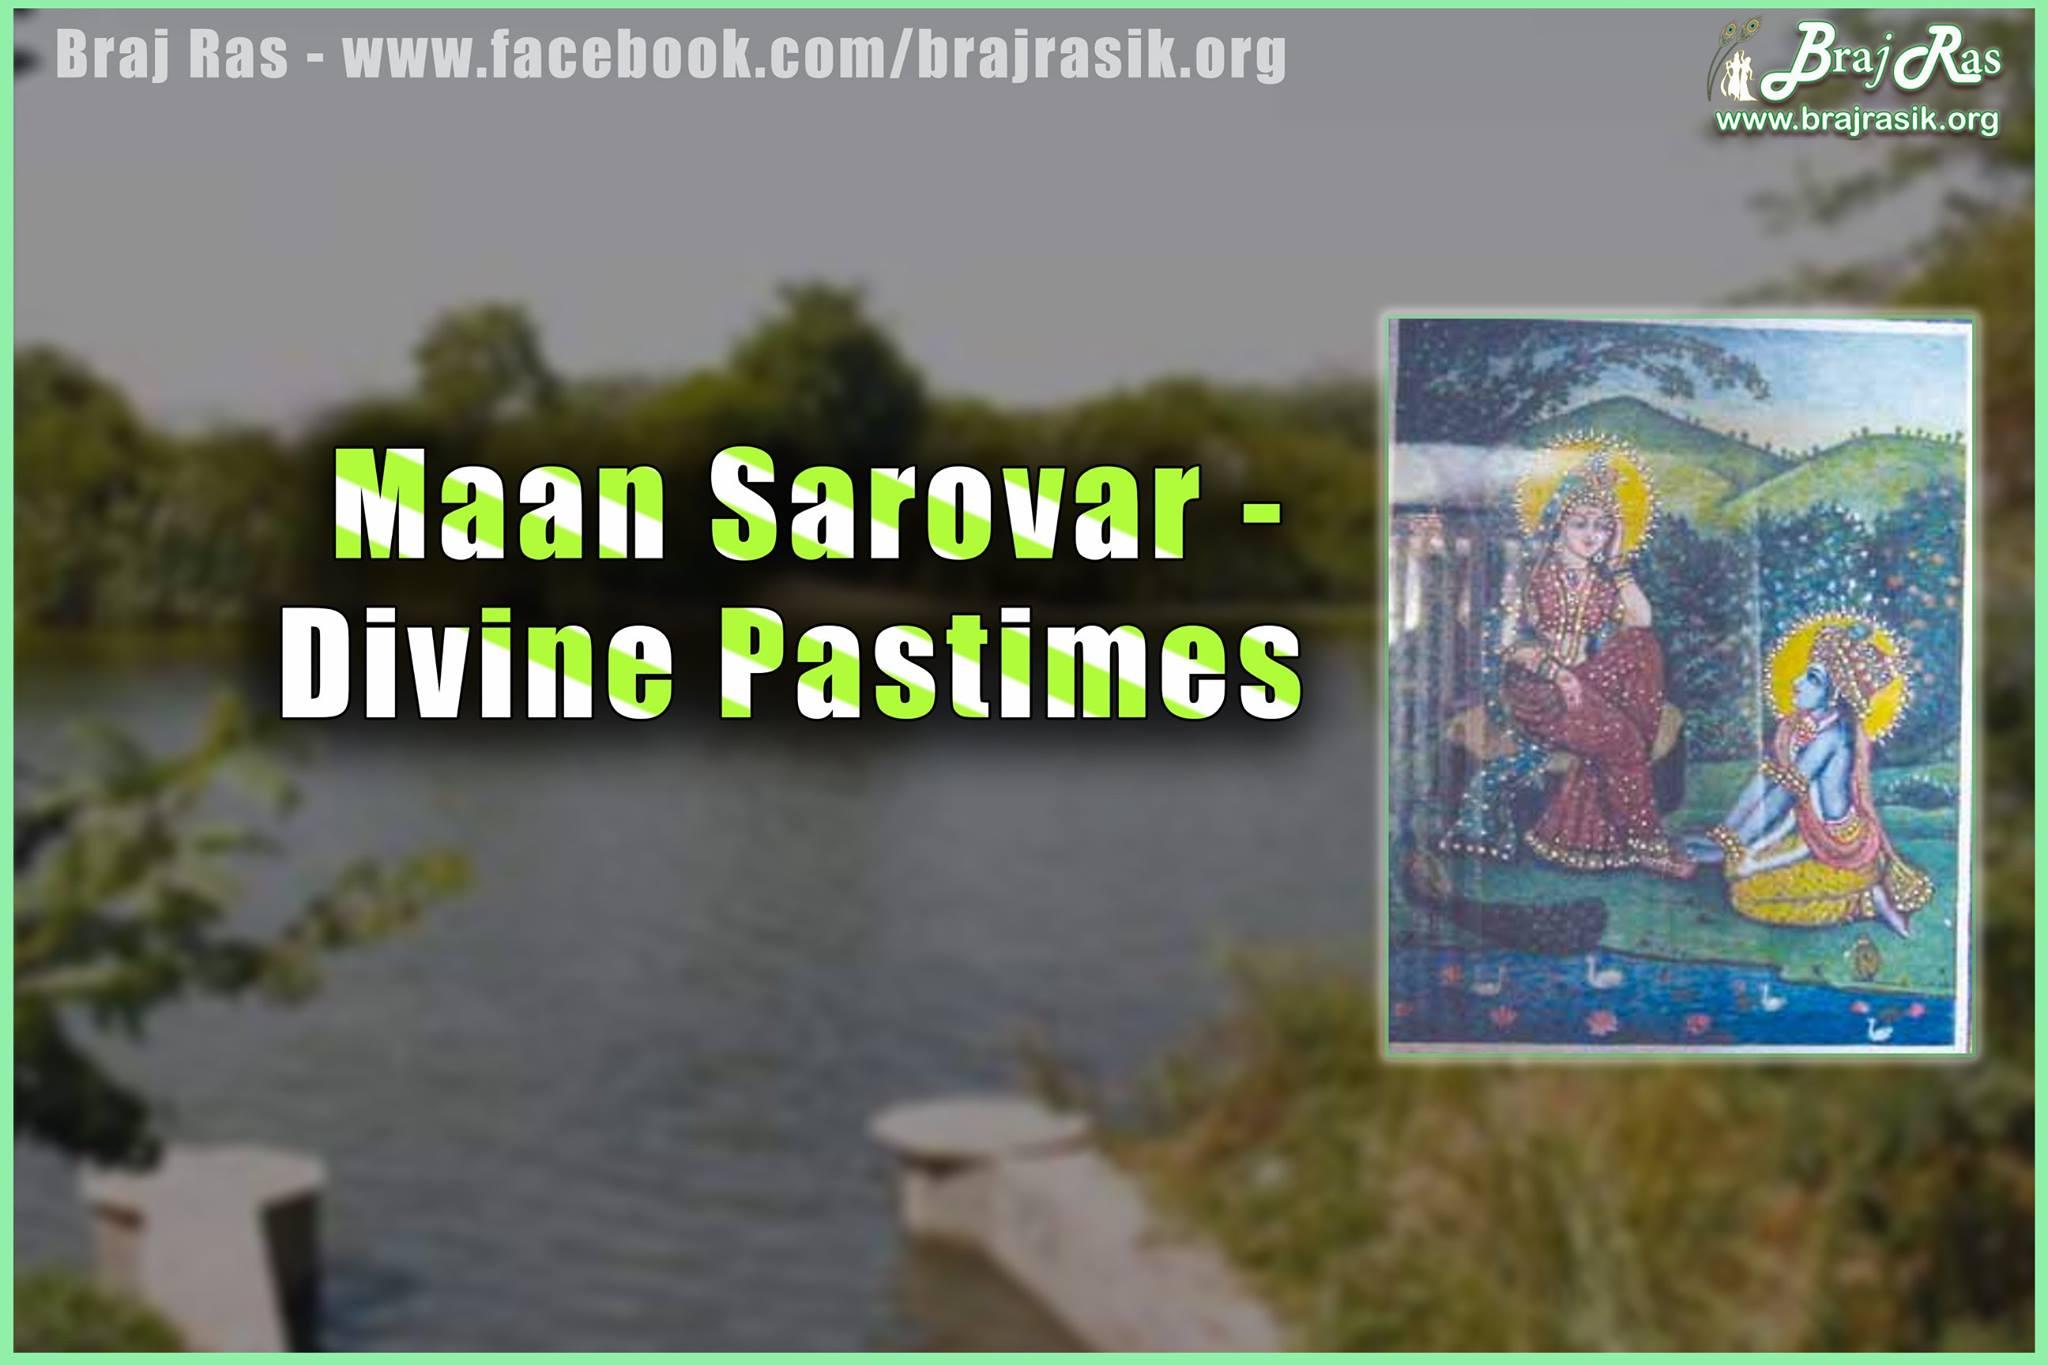 Maan Sarovar or Mana Sarovar - Divine Pastimes